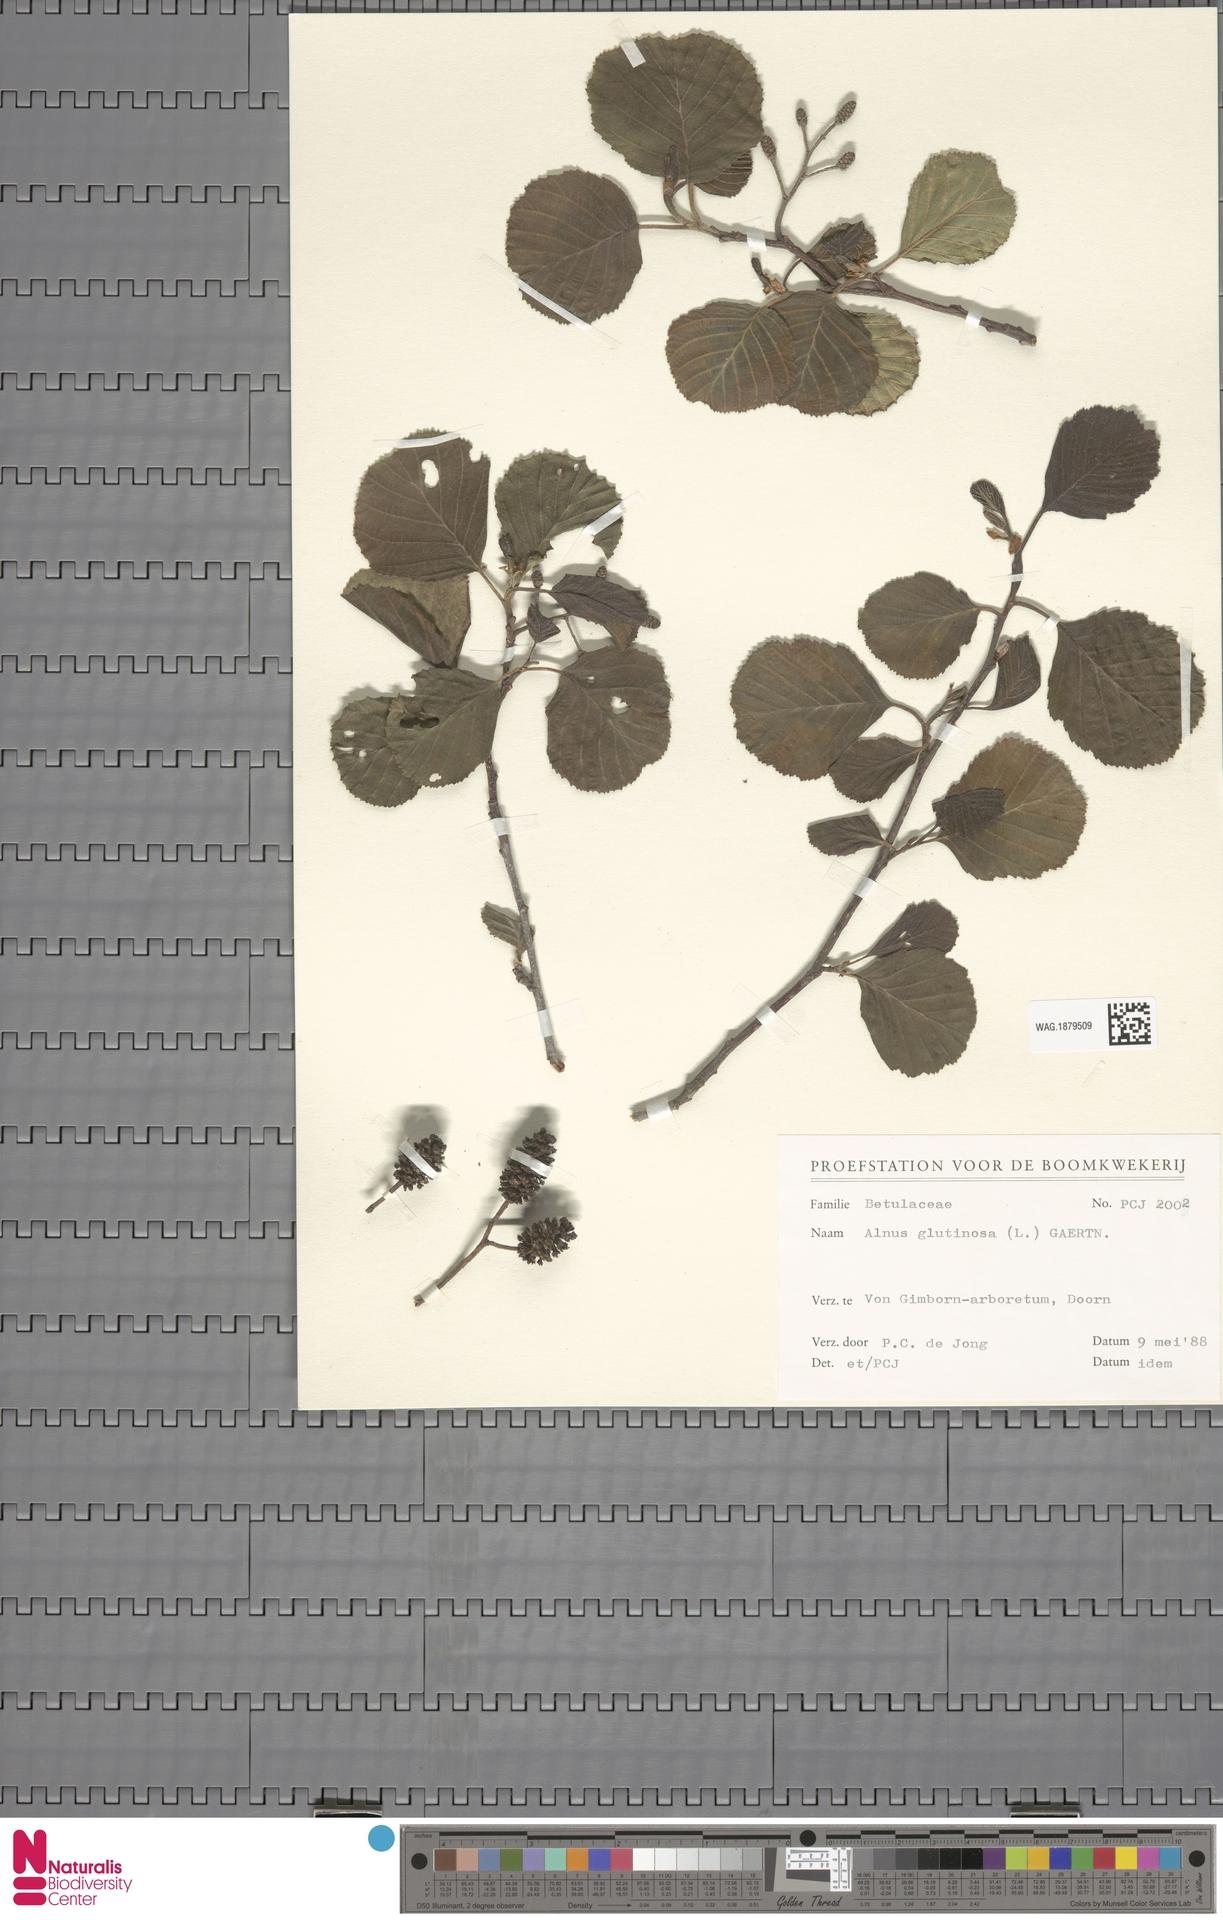 WAG.1879509 | Alnus glutinosa (L.) Gaertn.